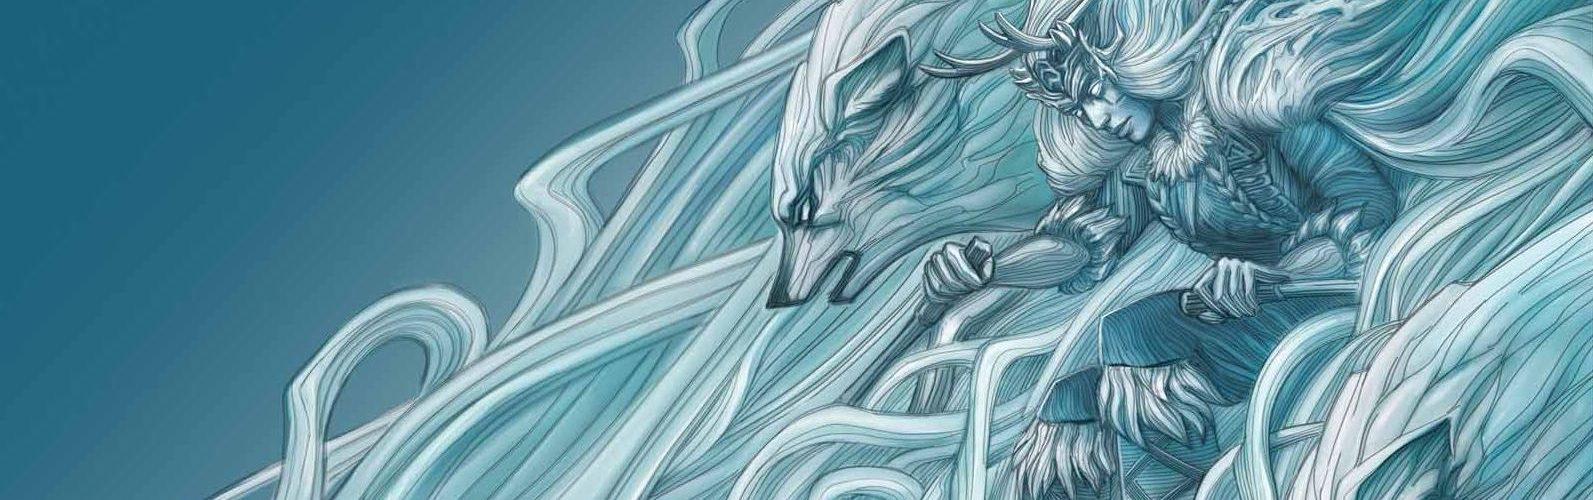 Mountain-Life-Blue-Mountains-winter-21-cover-detail-Skadi-illustration-by-Stu-MacKay-Smith